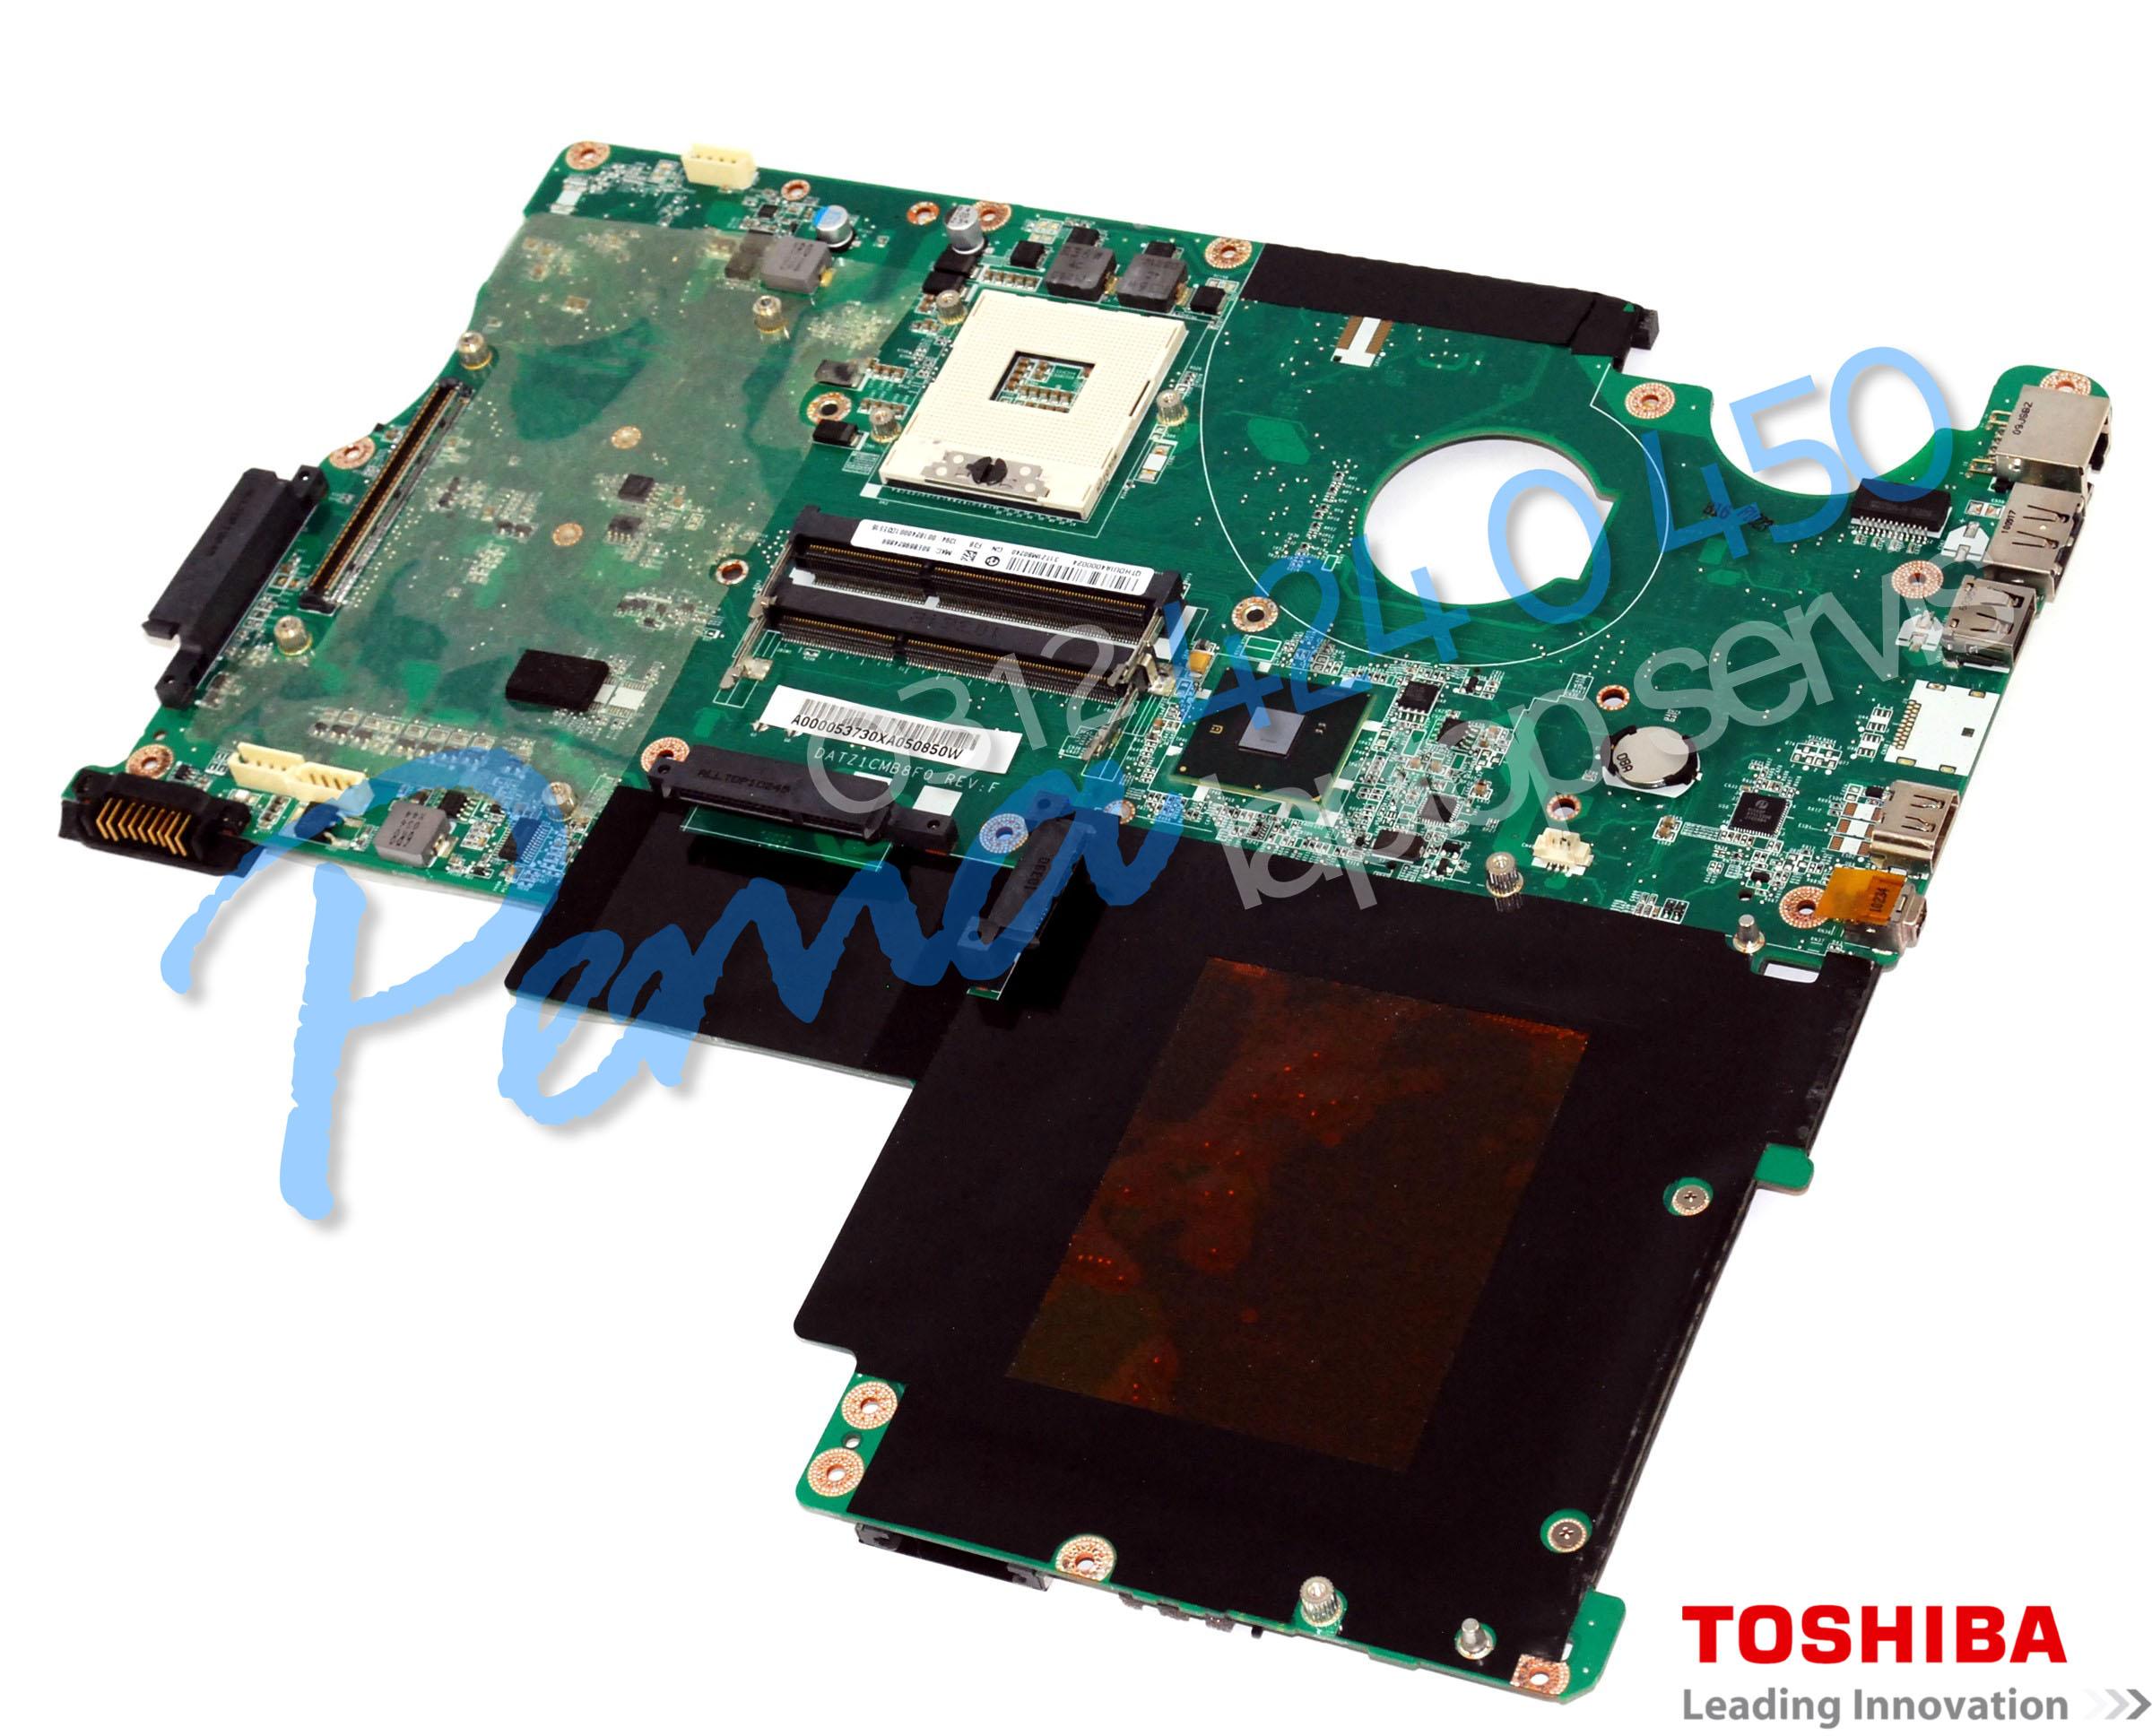 Toshiba Qosmio X500 Anakart